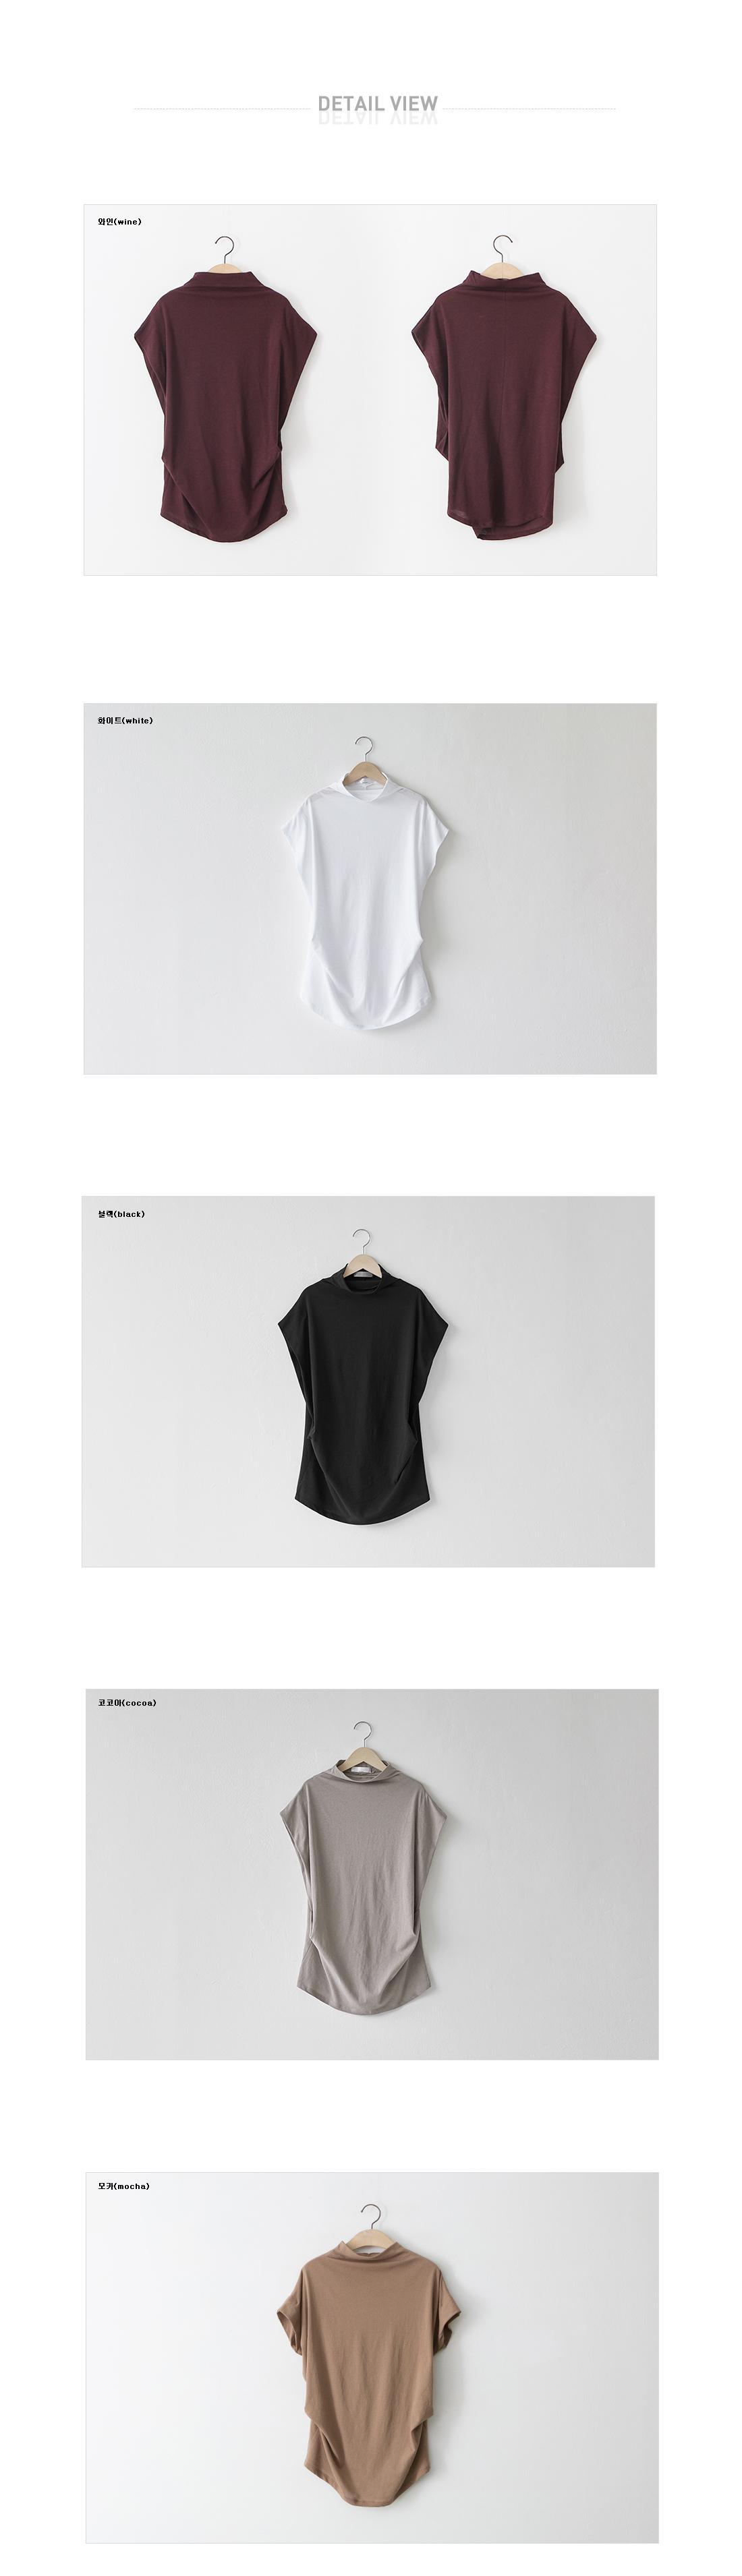 Karashy Shirred Turtleneck T-shirt #19648